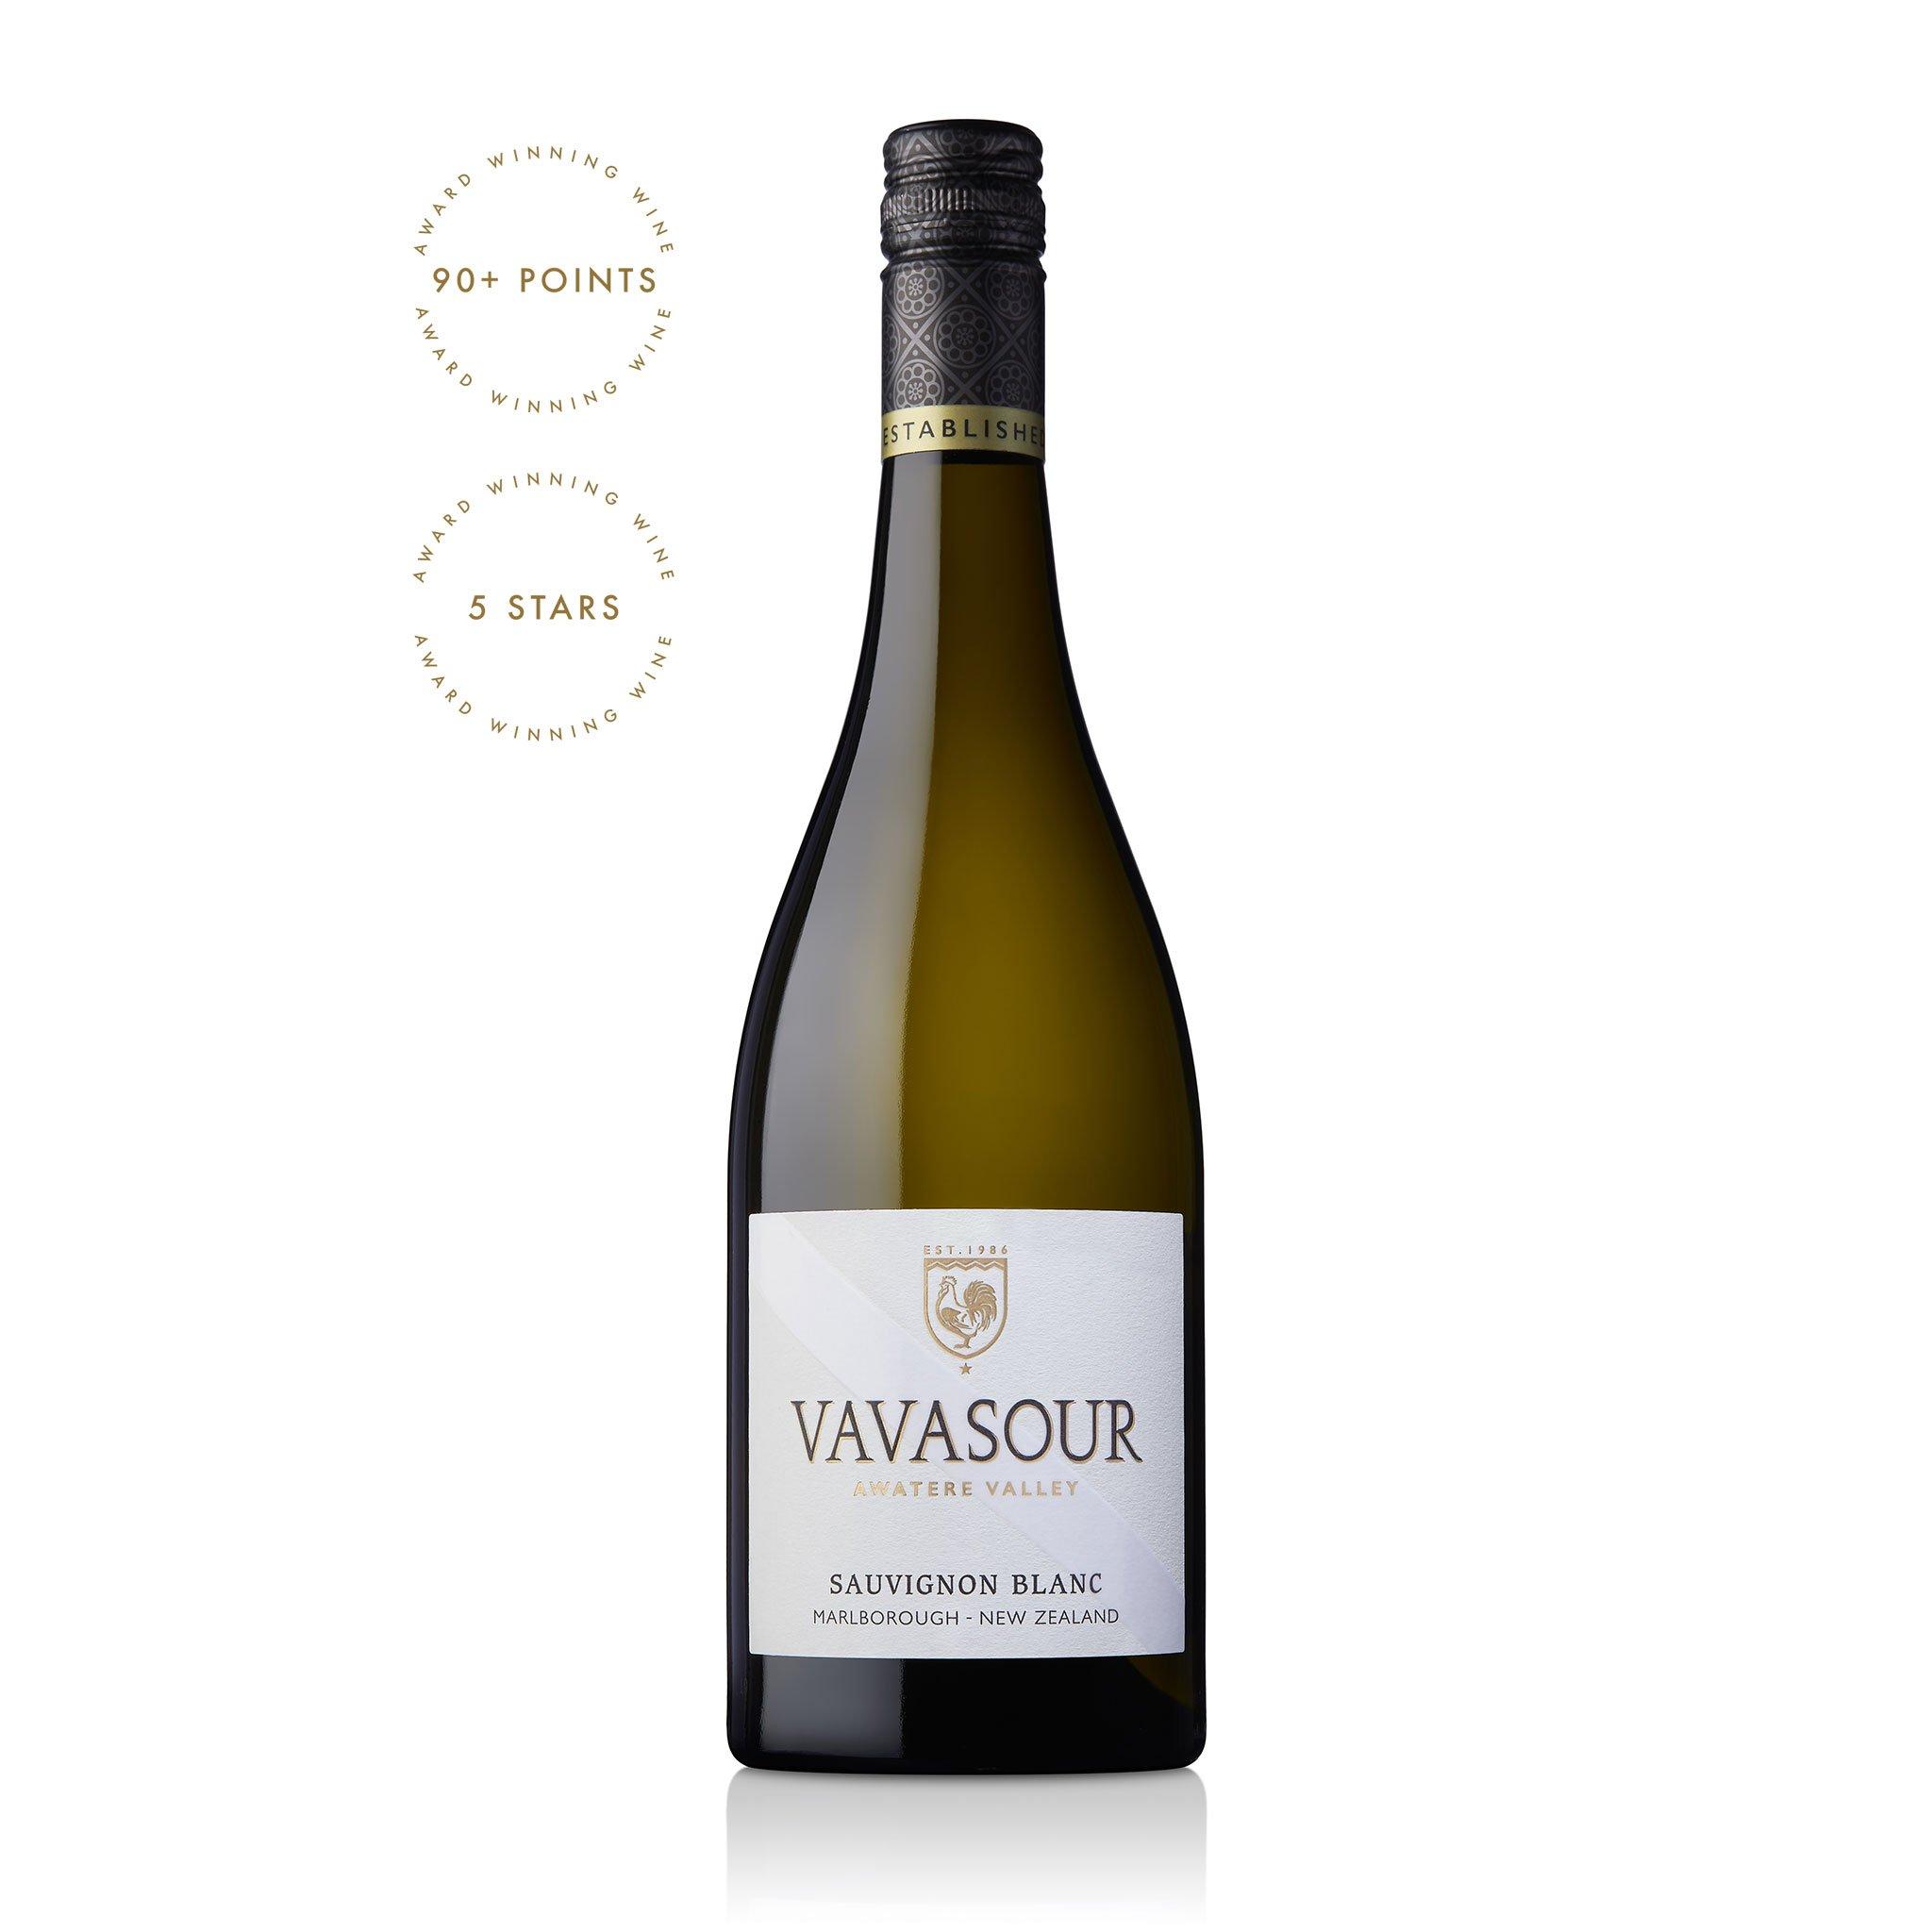 Vavasour Sauvignon Blanc 2019 6 Bottles